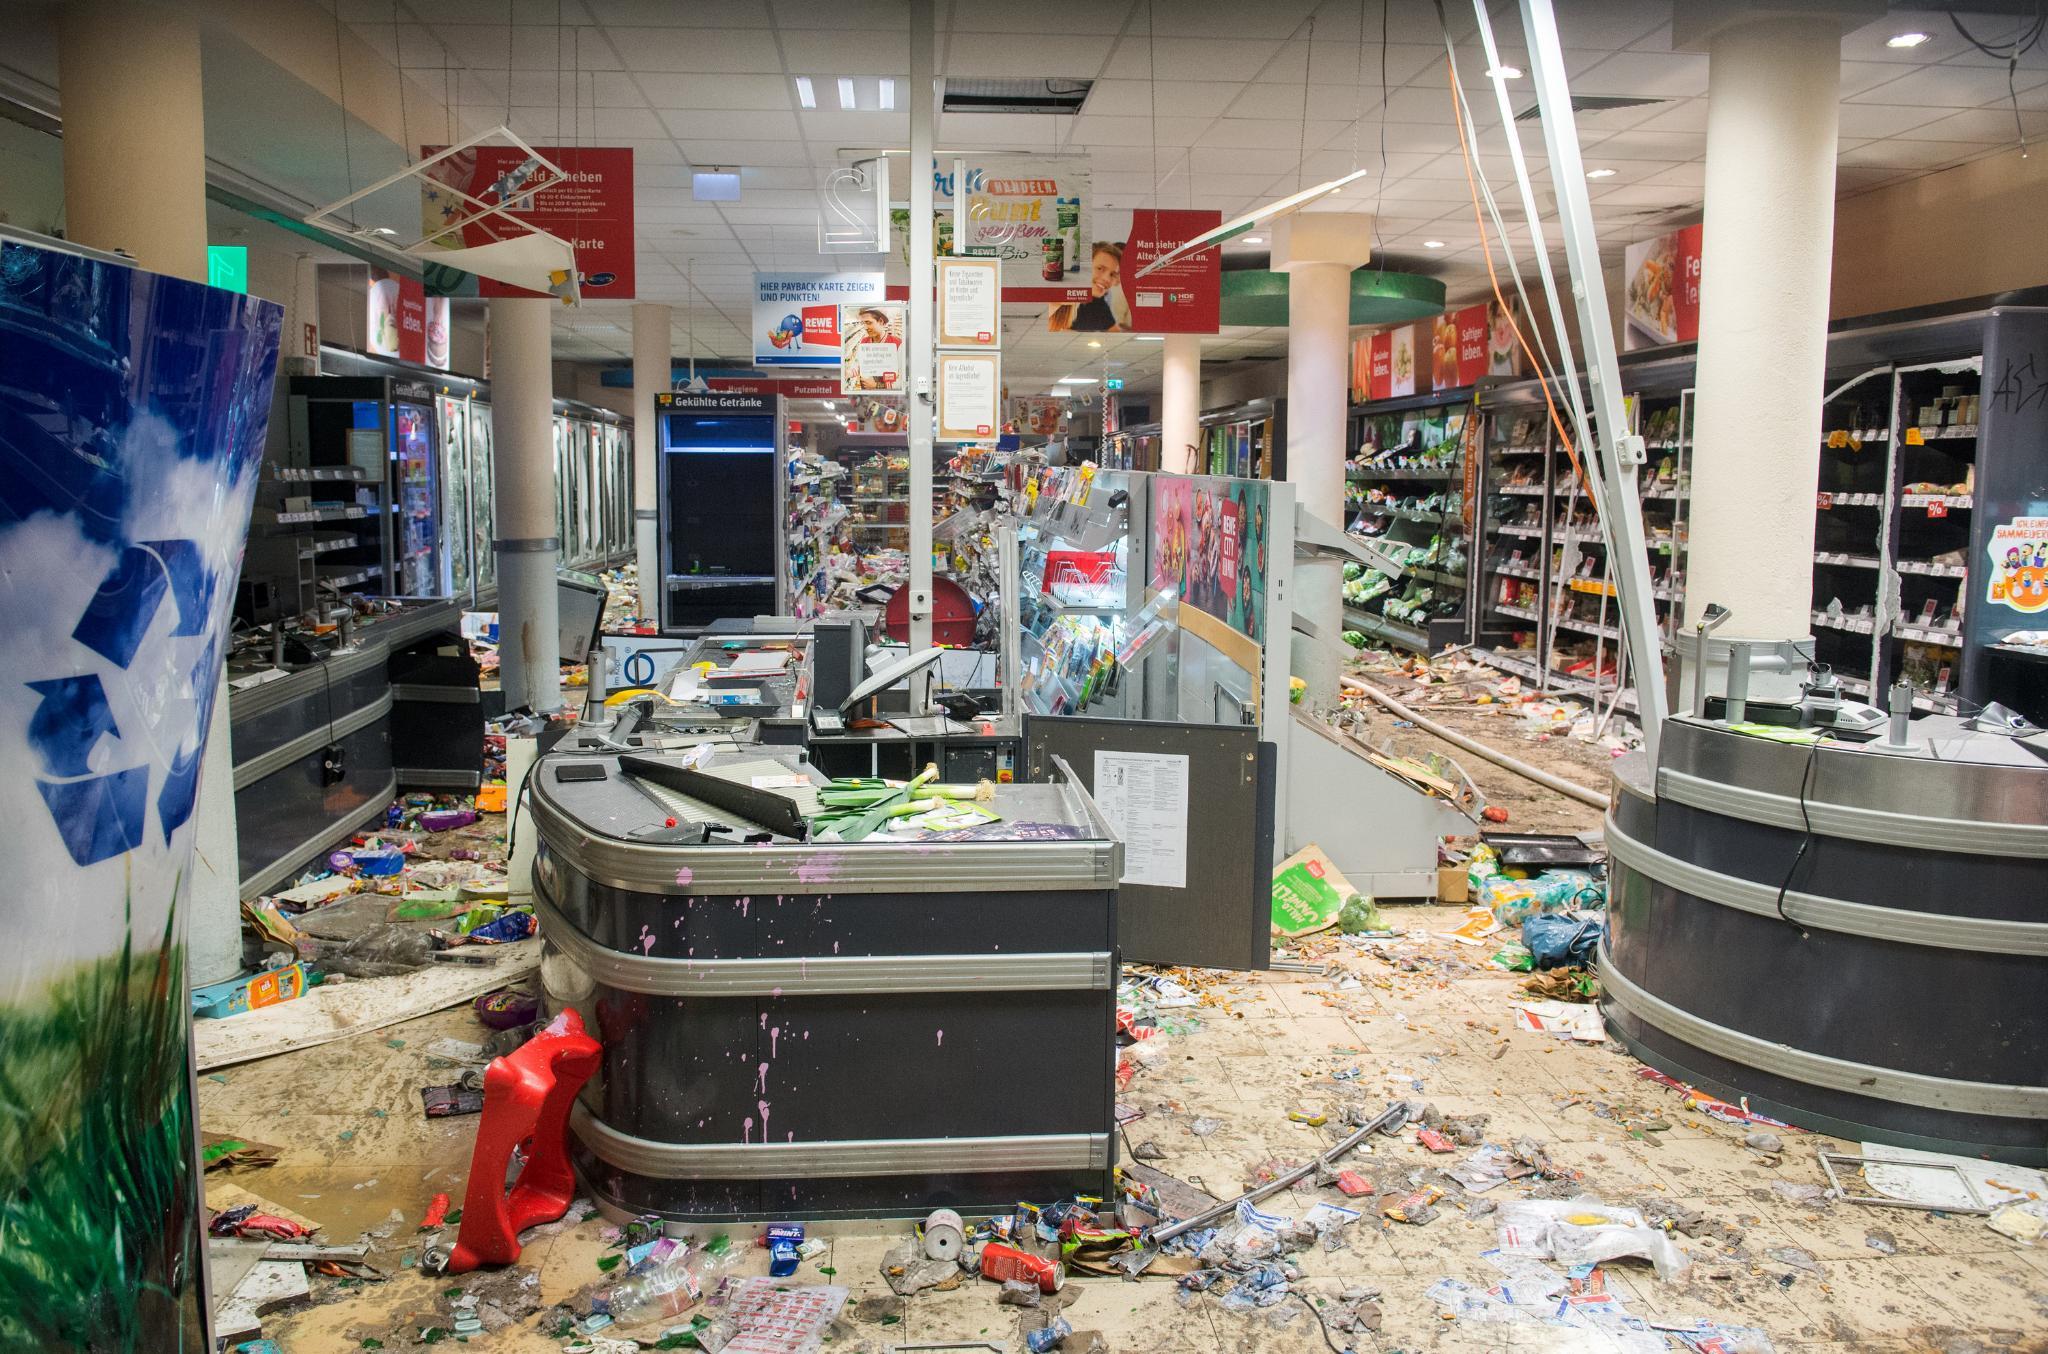 G20-Plünderer bekommt Bewährungsstrafe | FINK.HAMBURG